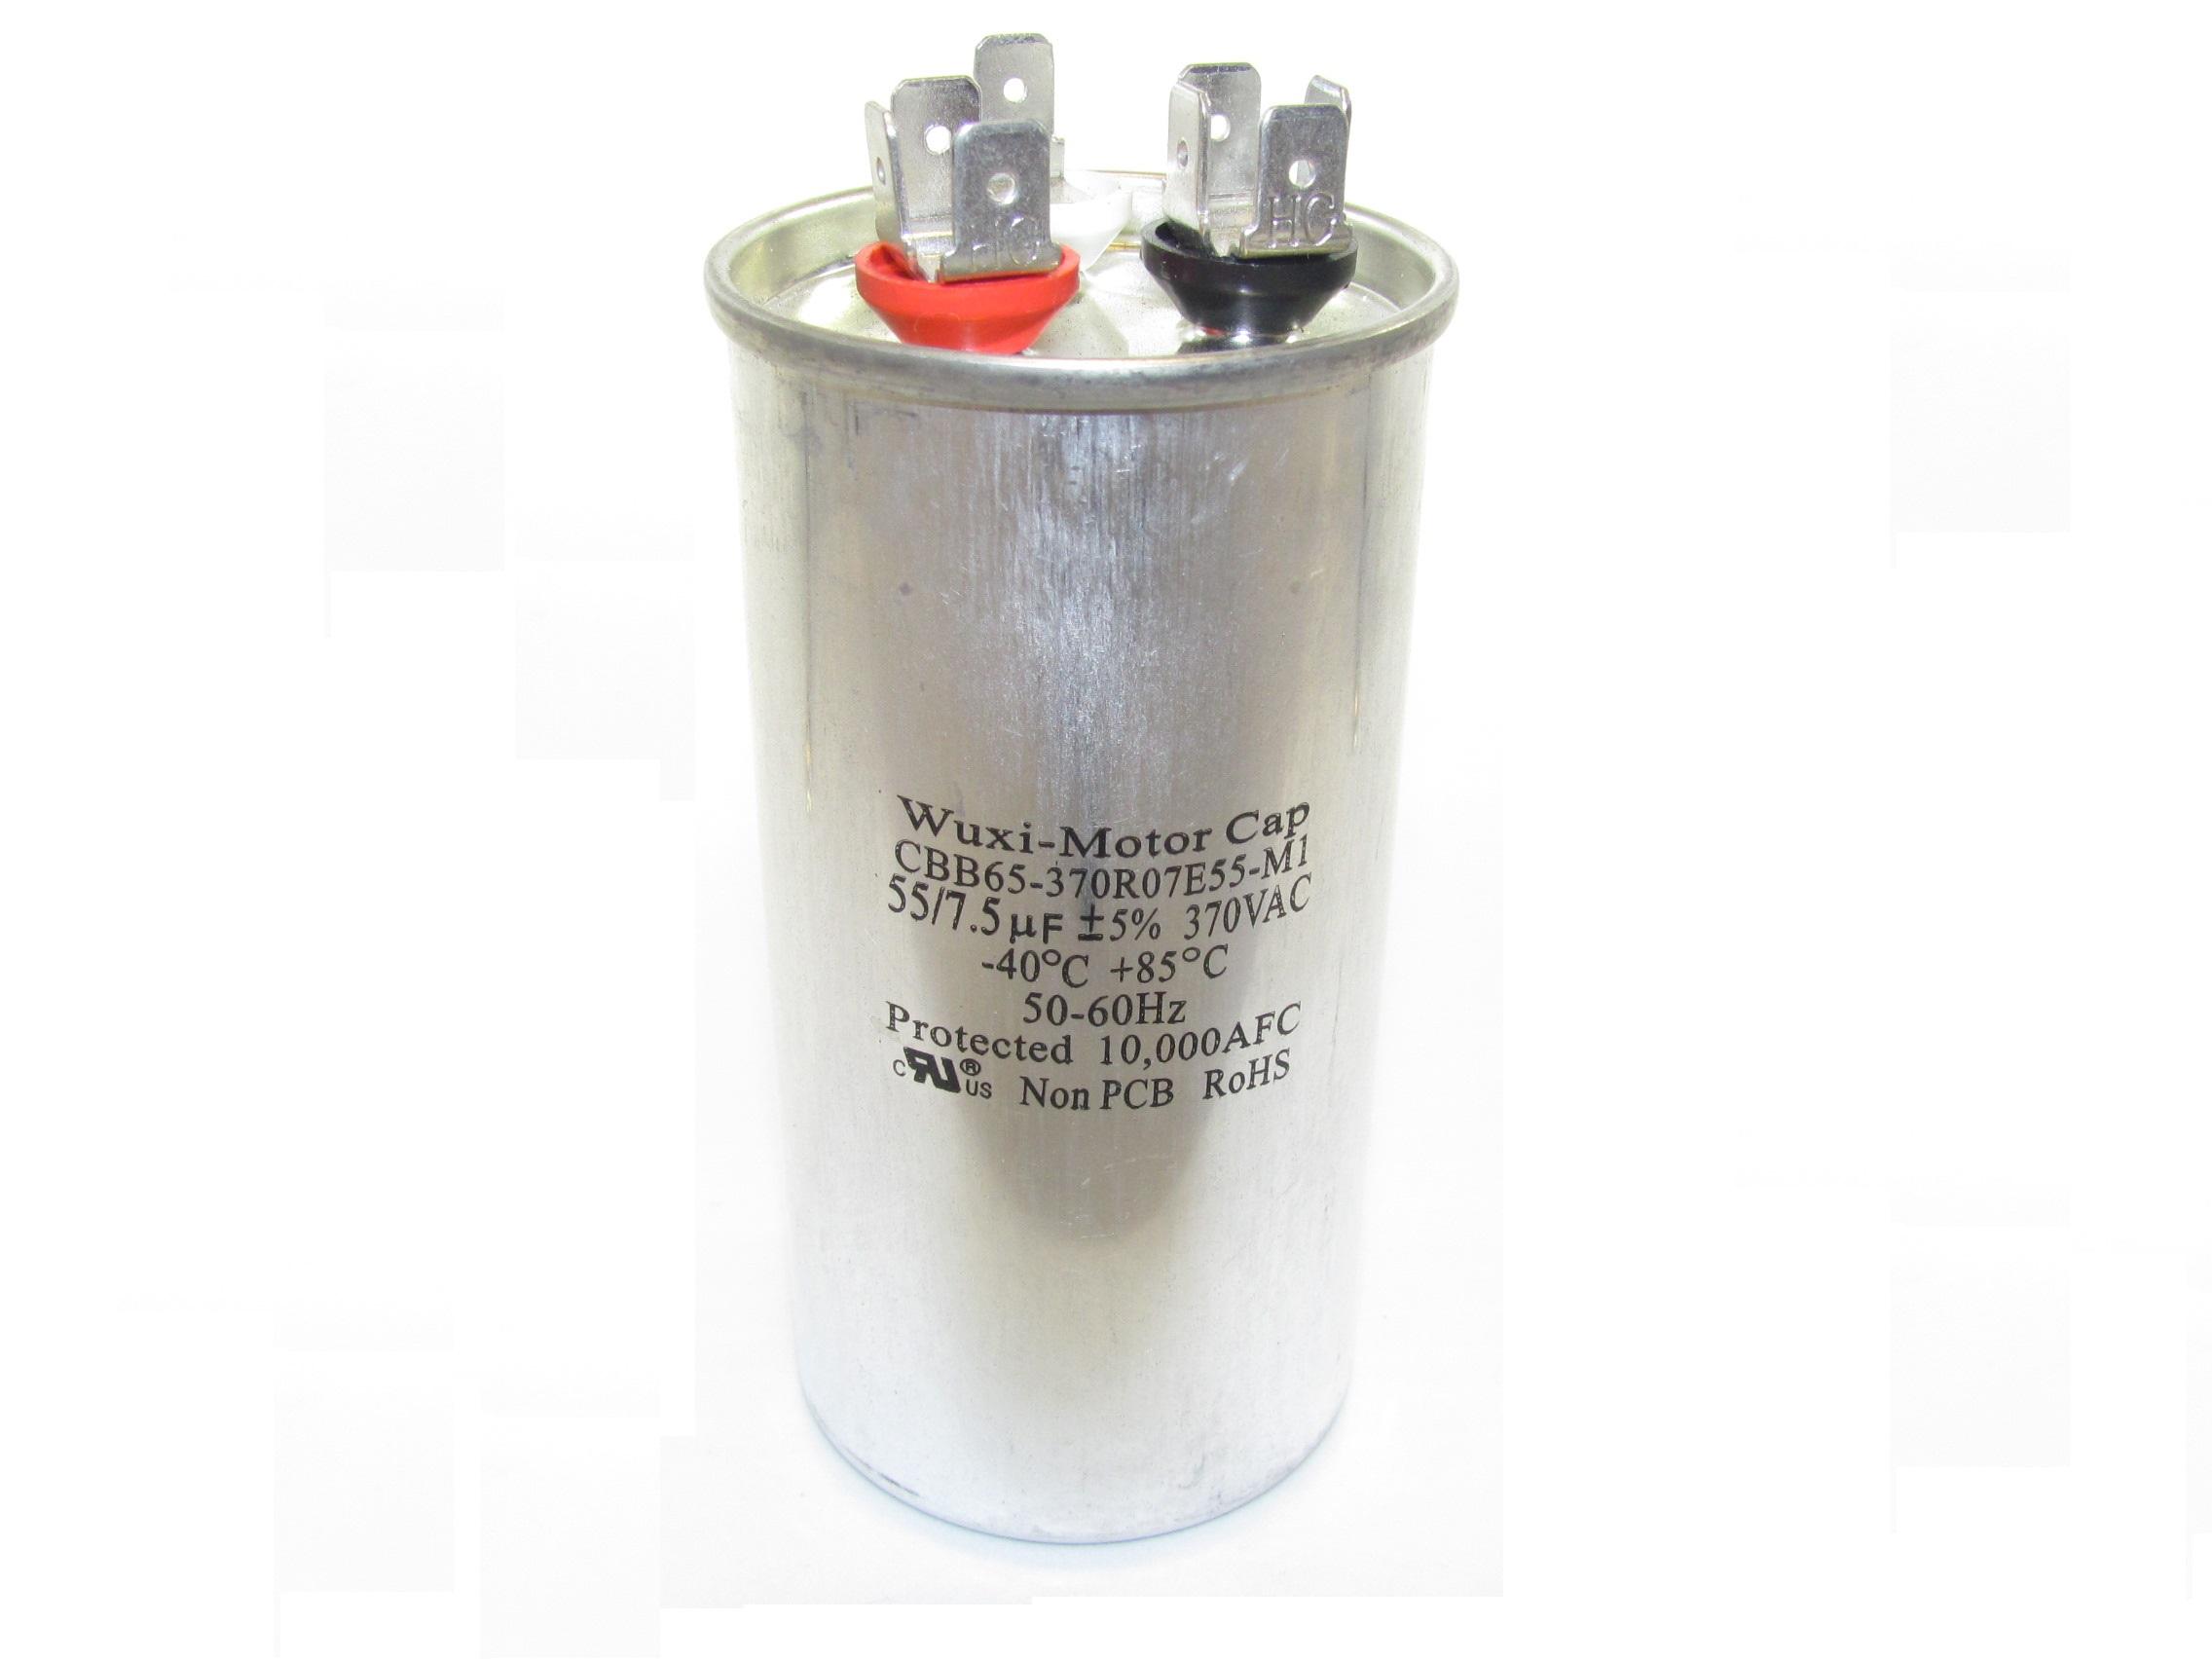 CBB65 Motor Run Capacitors (Round-Shaped, Dual Capacitance Value)